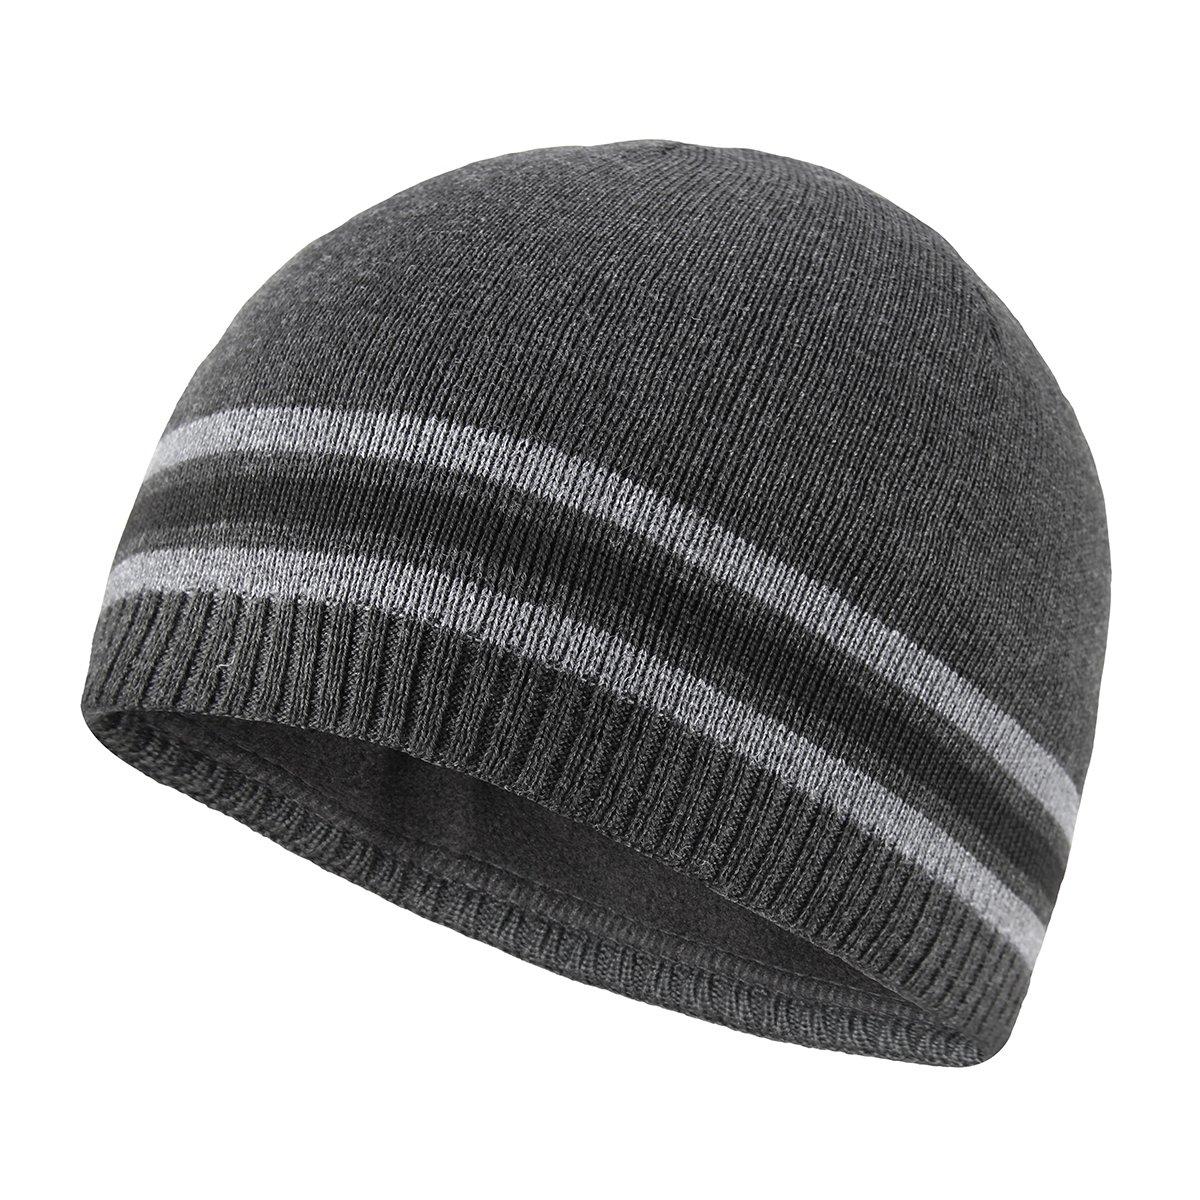 48dec71cdbf OMECHY Mens Winter Beanie Hat Warm Cuff Toboggan Knit Ski Skull Cap ...